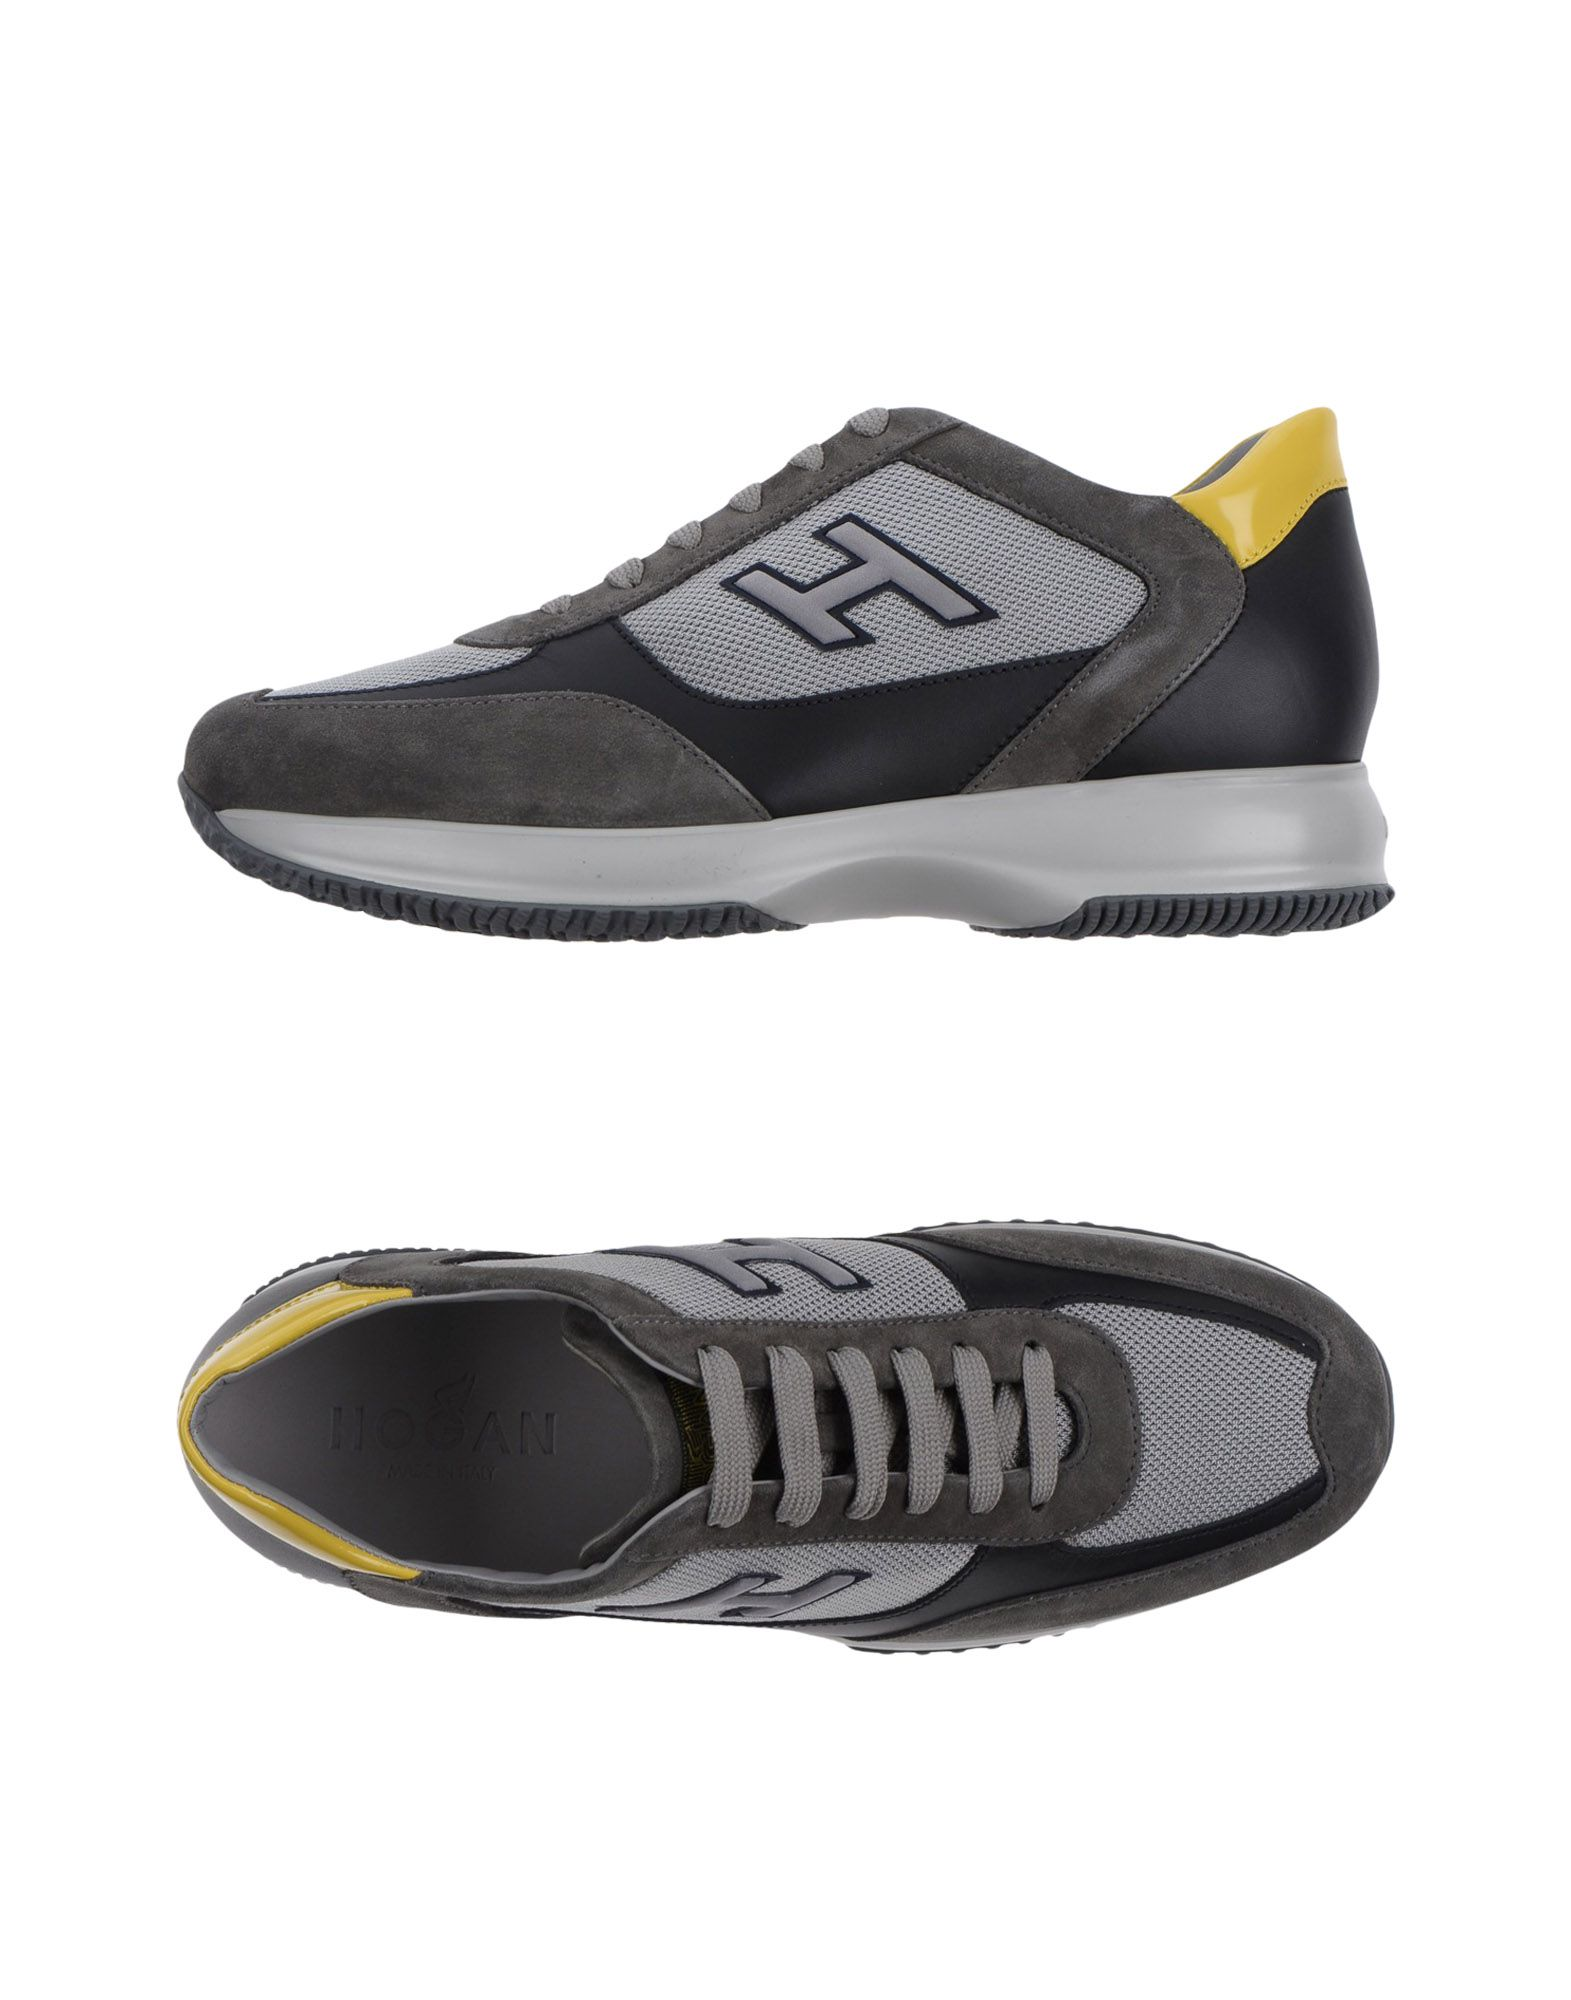 Hogan Sneakers Herren  11354218CM Gute Qualität beliebte Schuhe